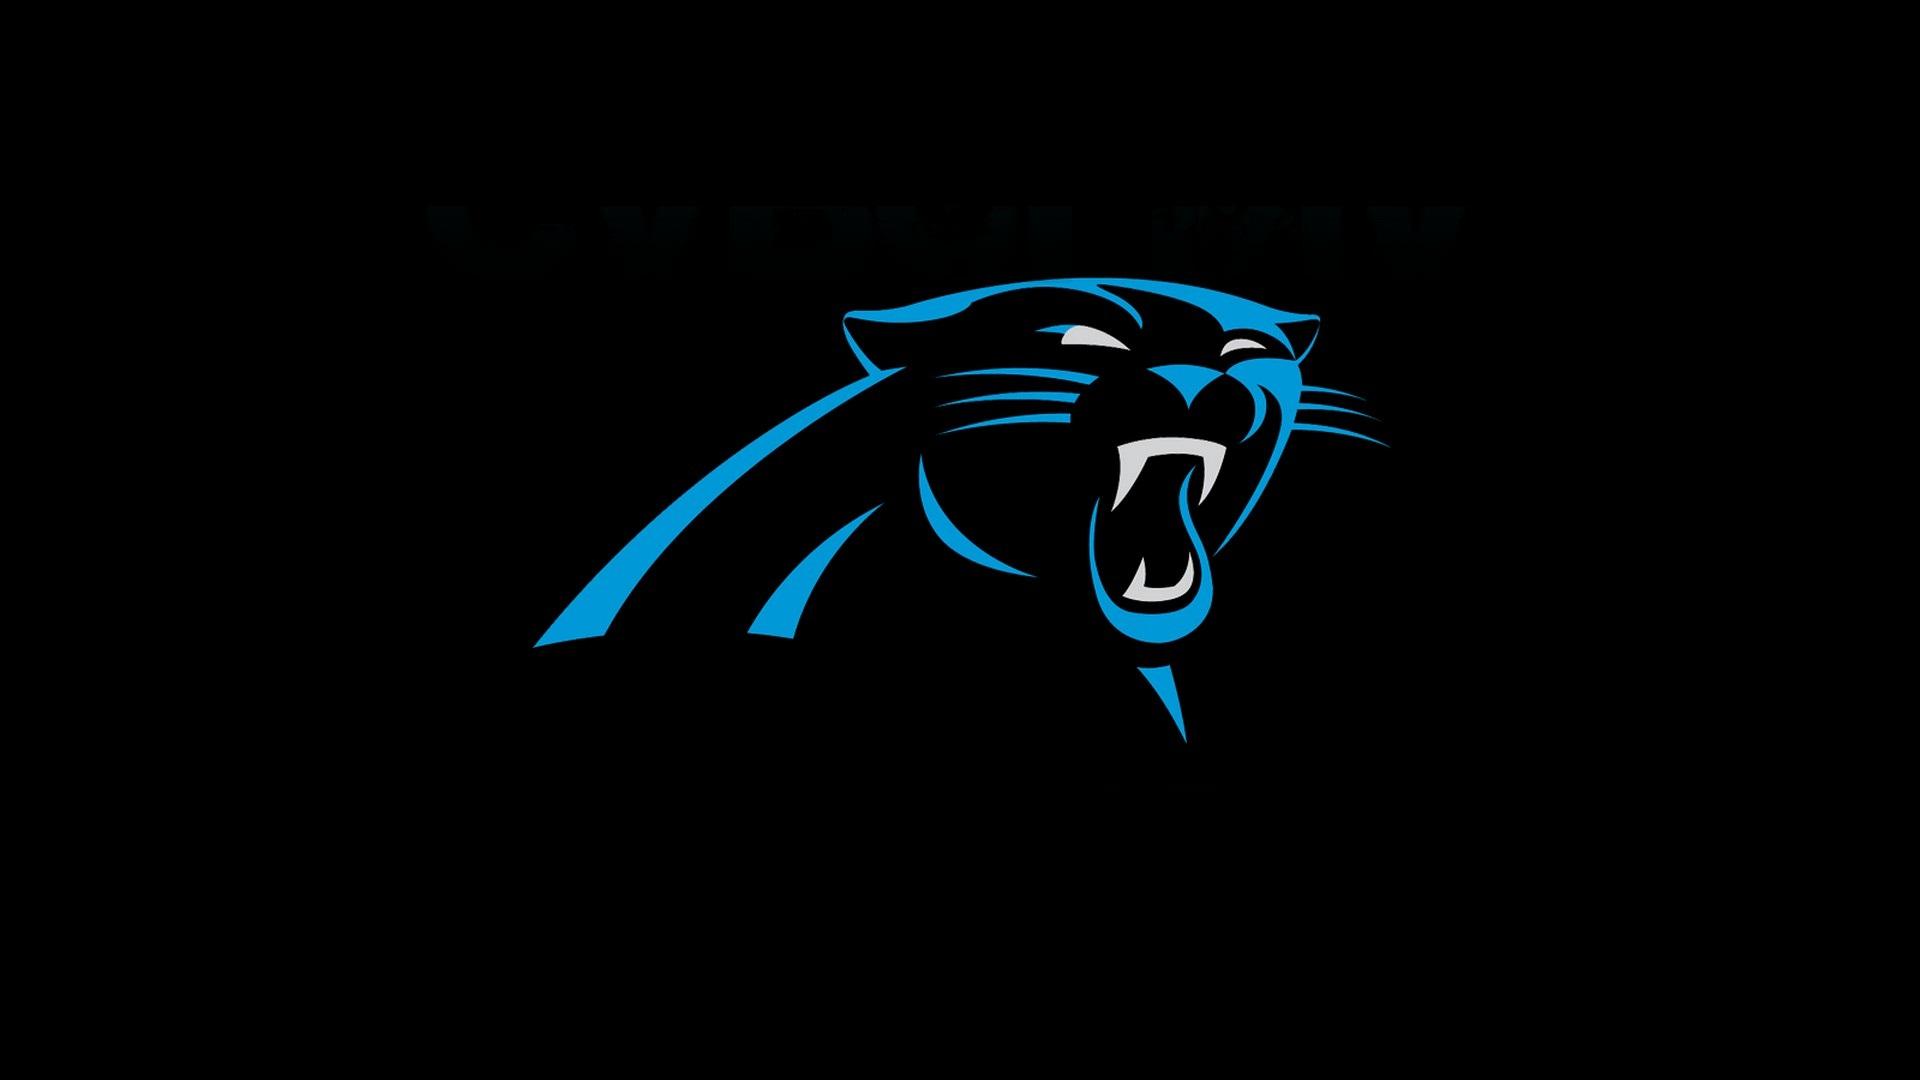 Football Wallpapers Hd For Android Carolina Panthers Wallpaper Hd 2018 Nfl Football Wallpapers